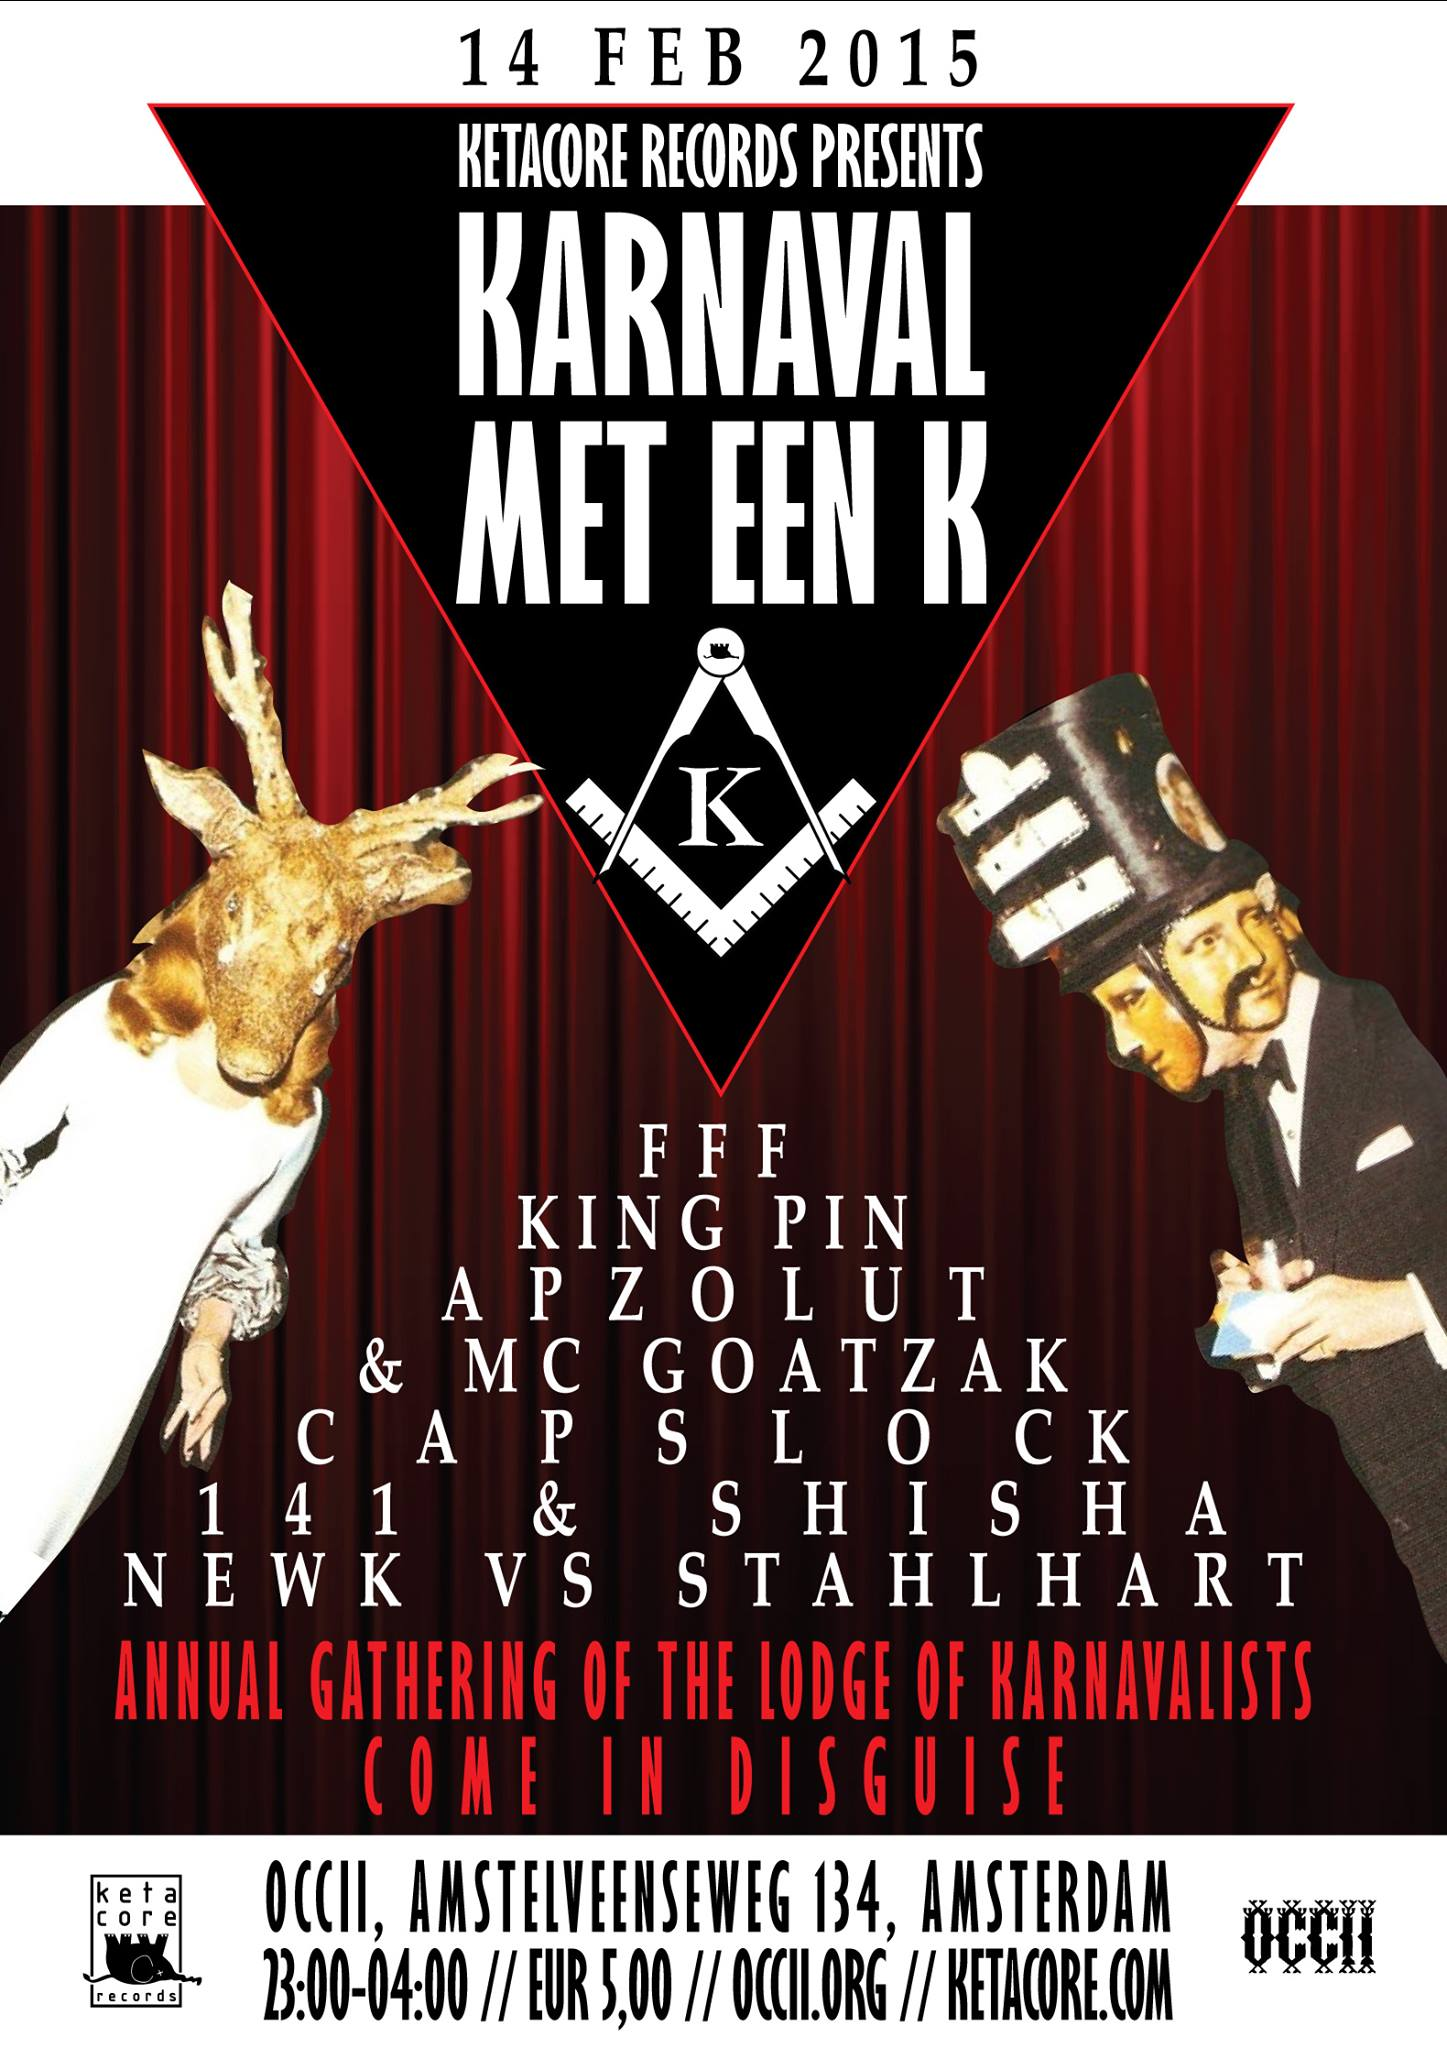 KARNAVAL met een K! -w/ FFF + MEOW MEOW & JEFFLOCKS + KINGPIN + CAPSLOCK + NEWK vs STAHLHARD + 141 vs SHISHA